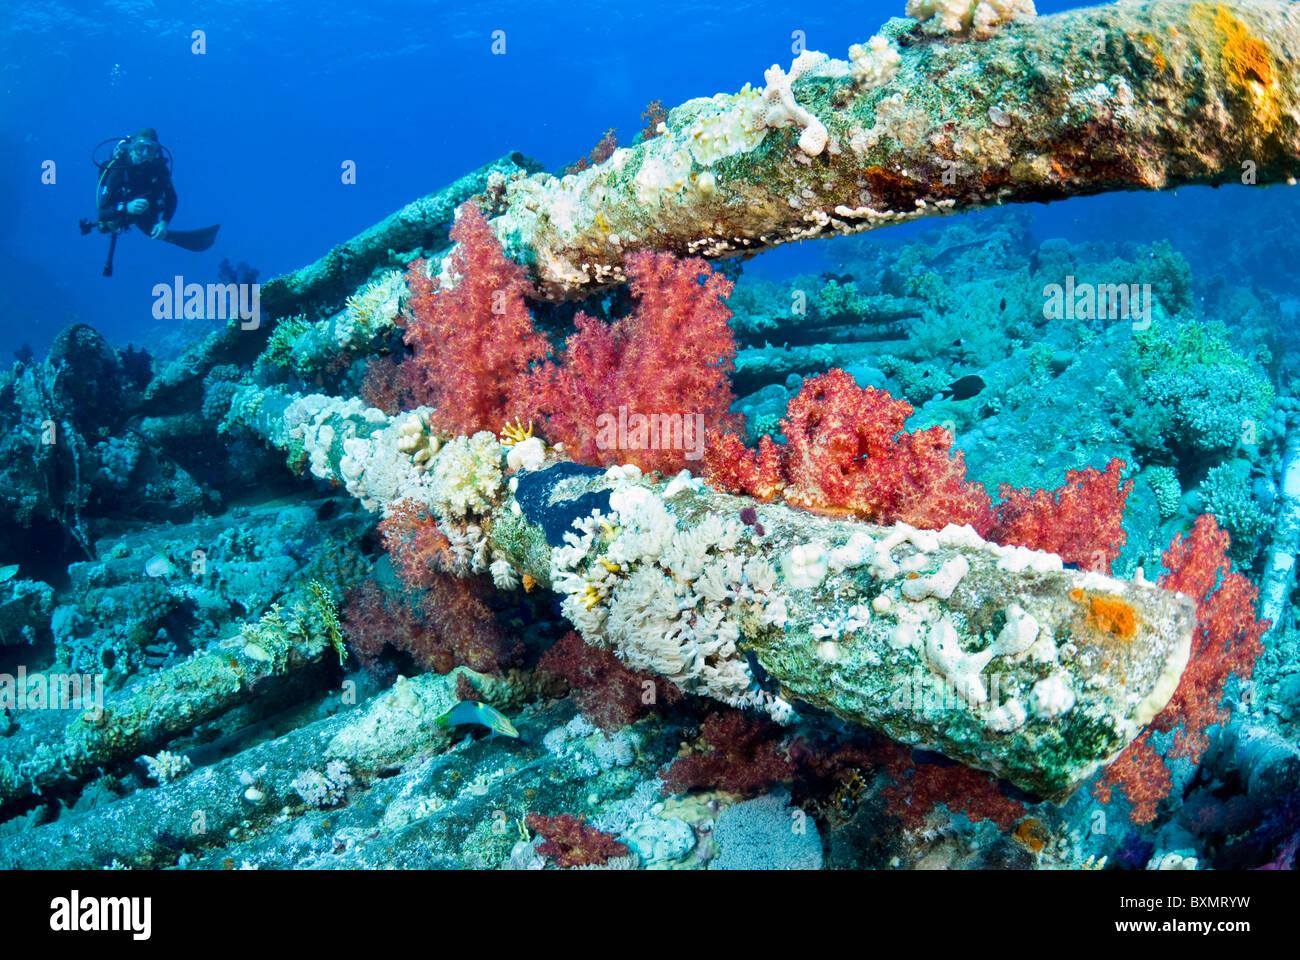 Wreck of Yolanda, Shark Yolanda reef, Ras Mohammed national park, Sinai, Egypt, Red Sea - Stock Image